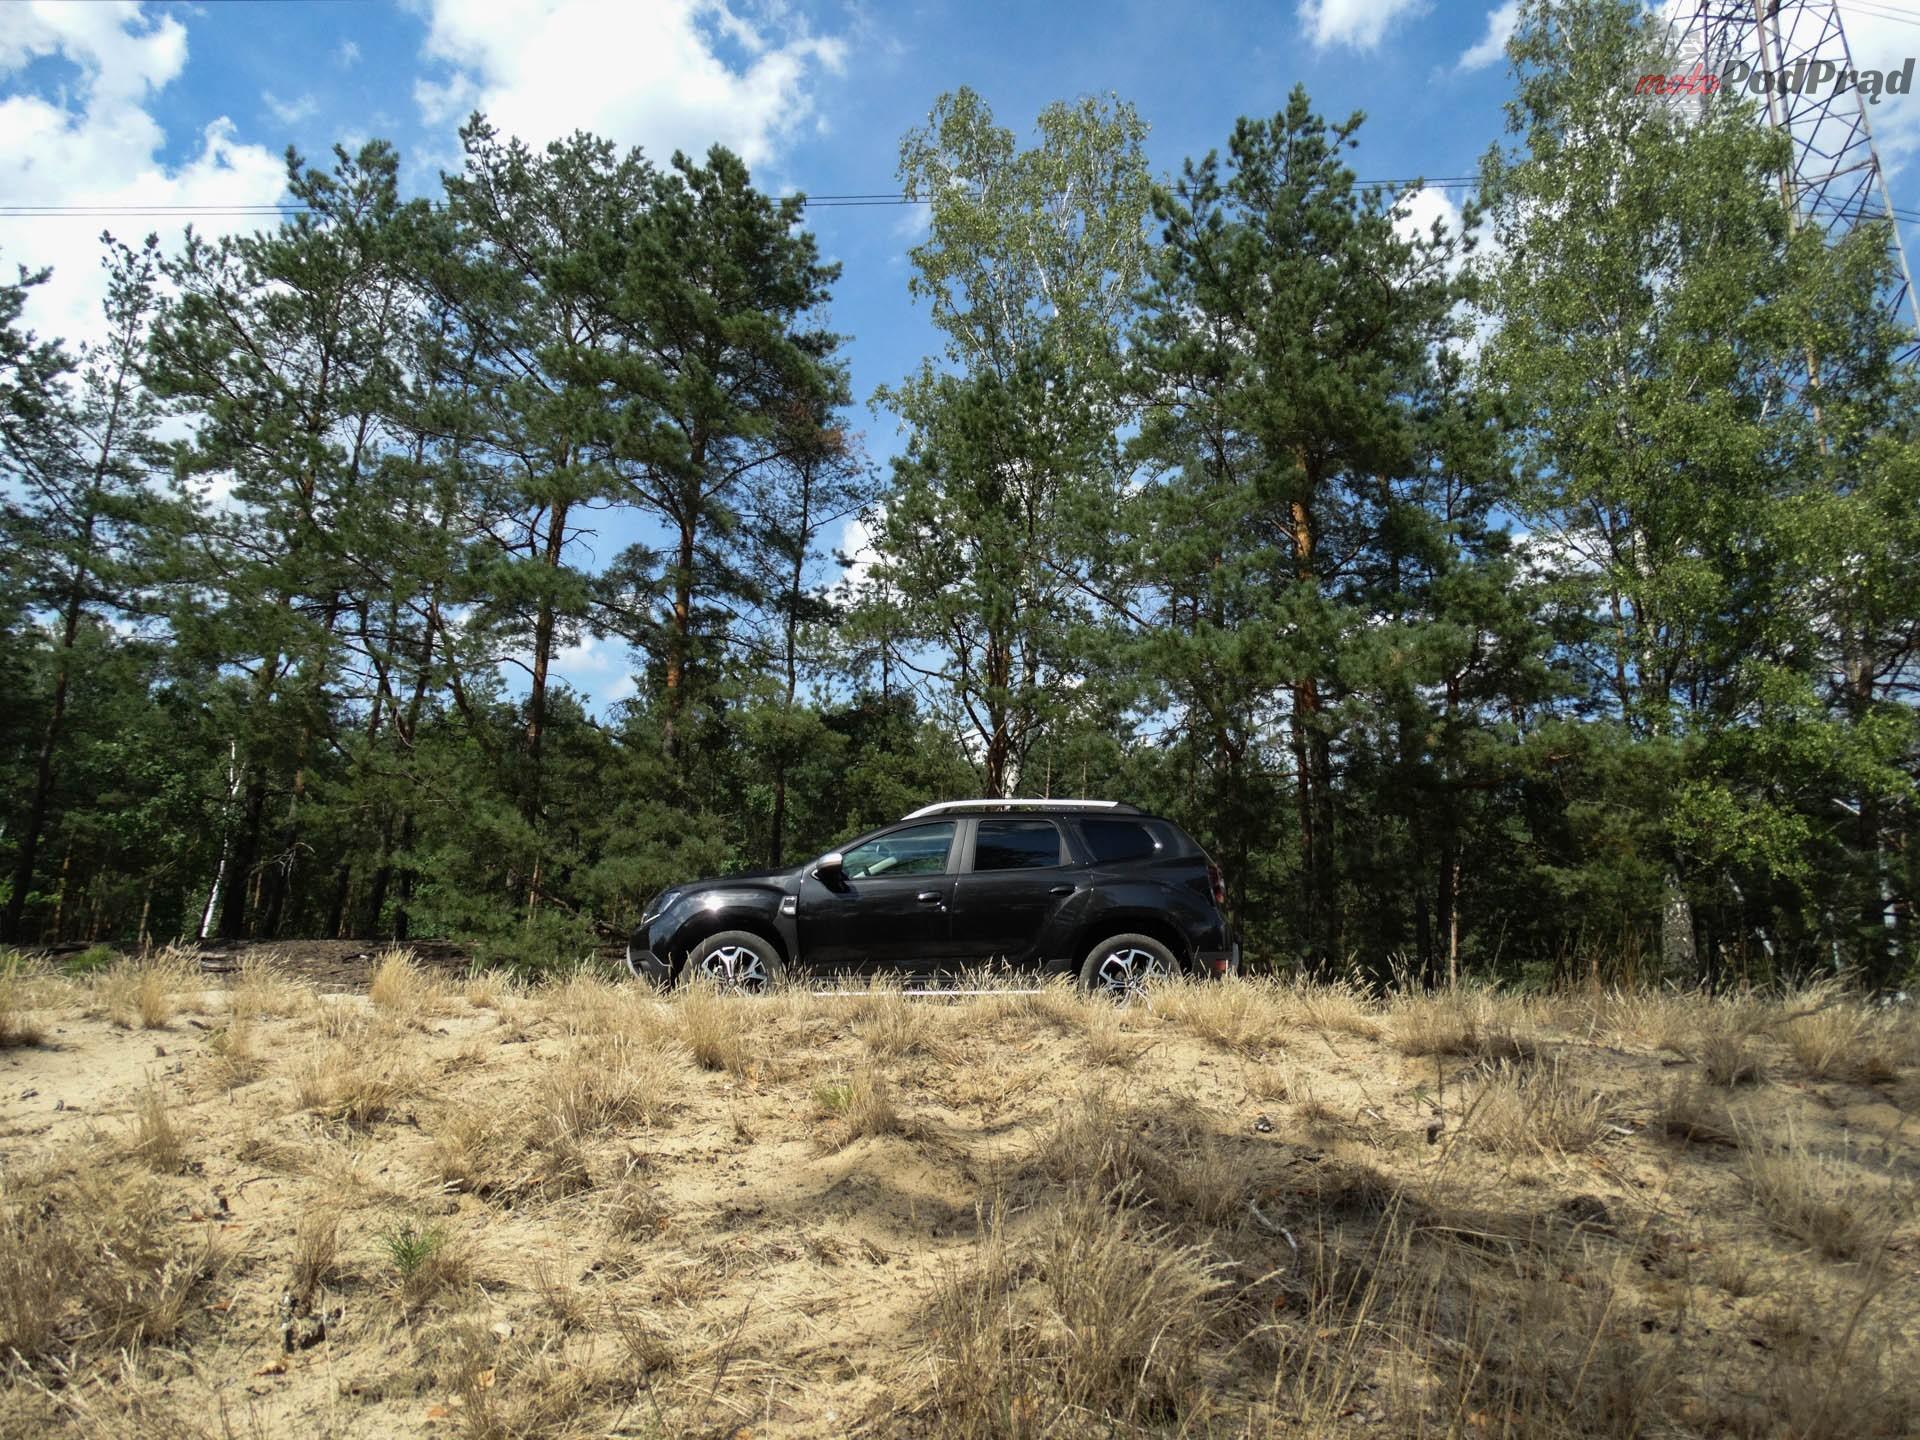 Dacia Duster 7 Test: Dacia Duster PRESTIGE 1.5 dci 4WD – w prostocie siła!